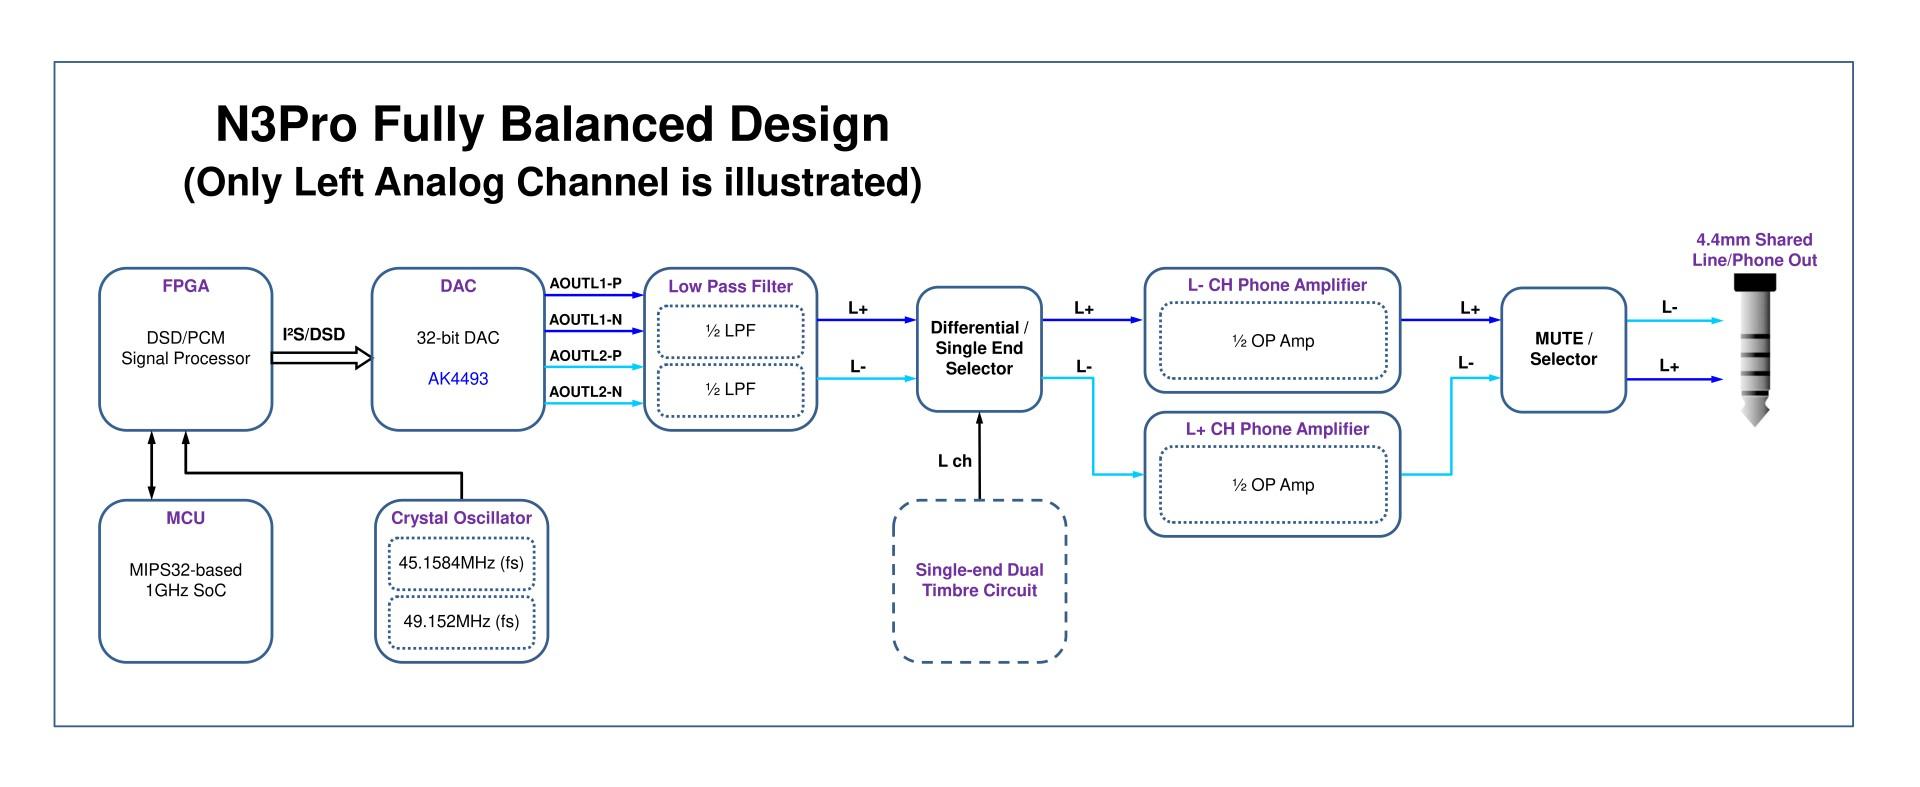 N3Pro Fully Balanced Design.jpg